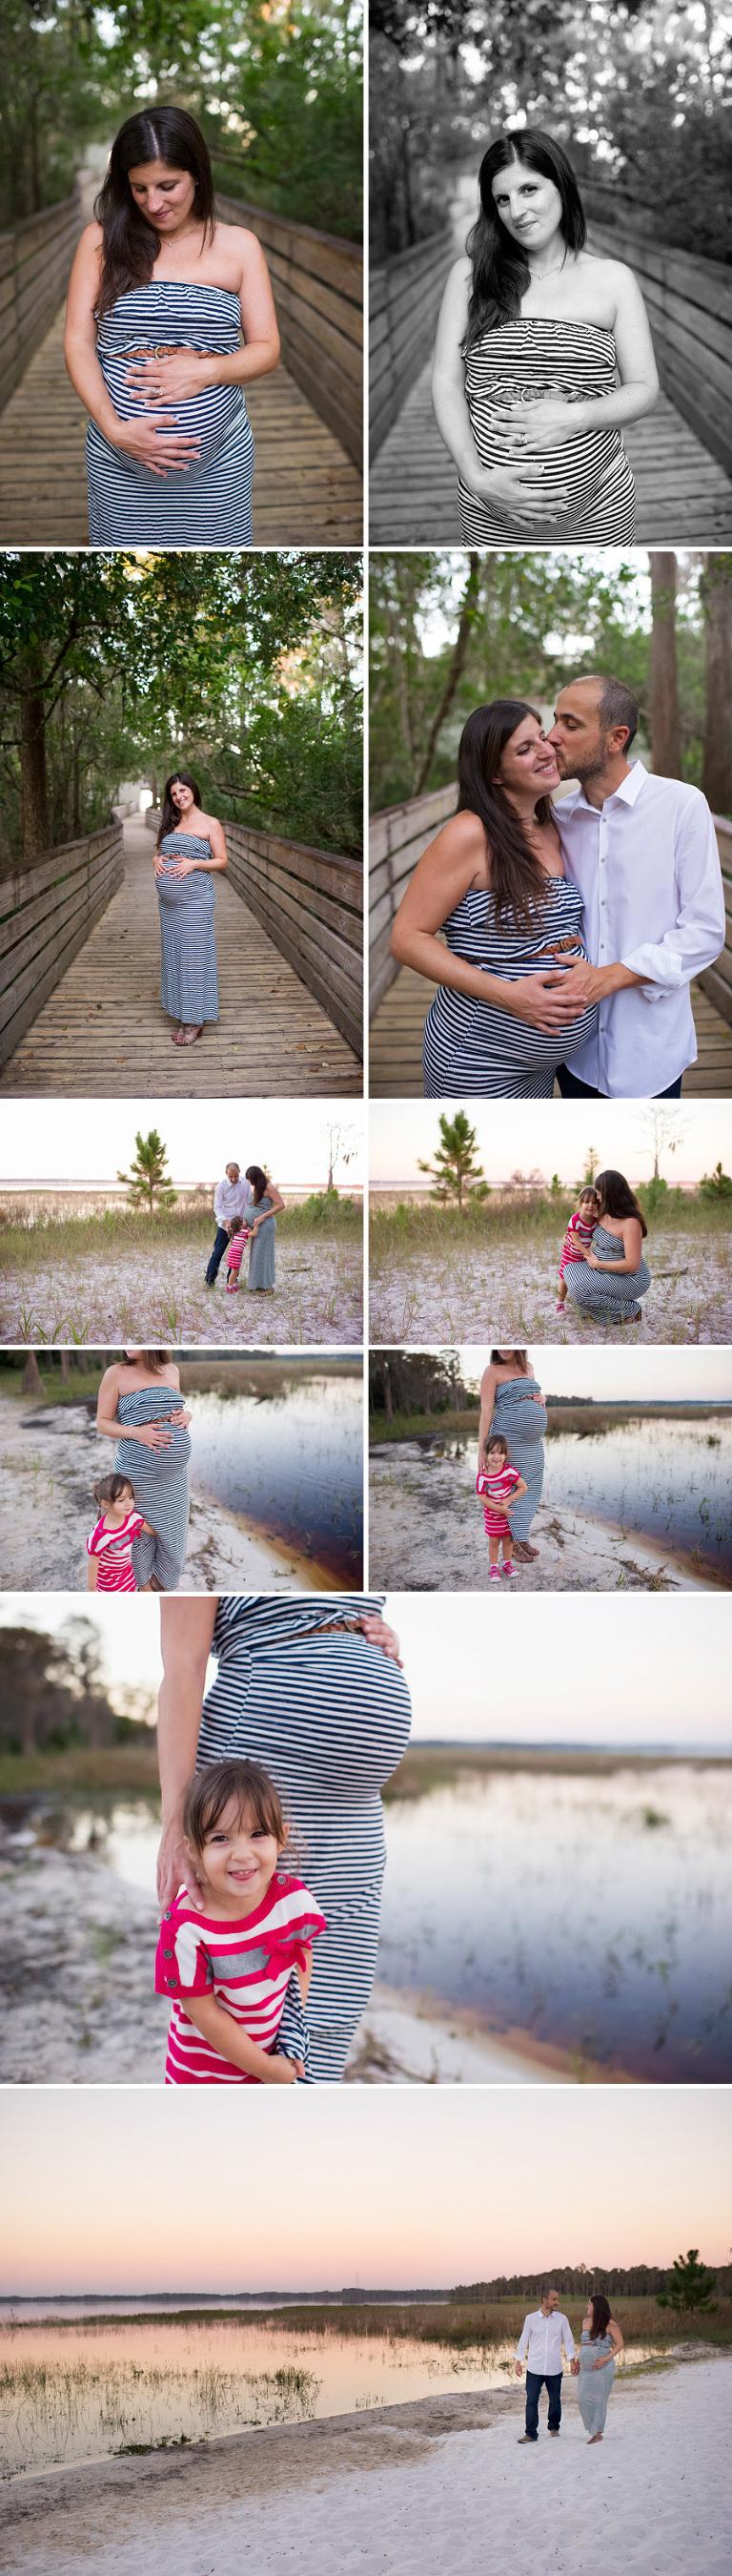 Orlando Maternity & Family Photographer